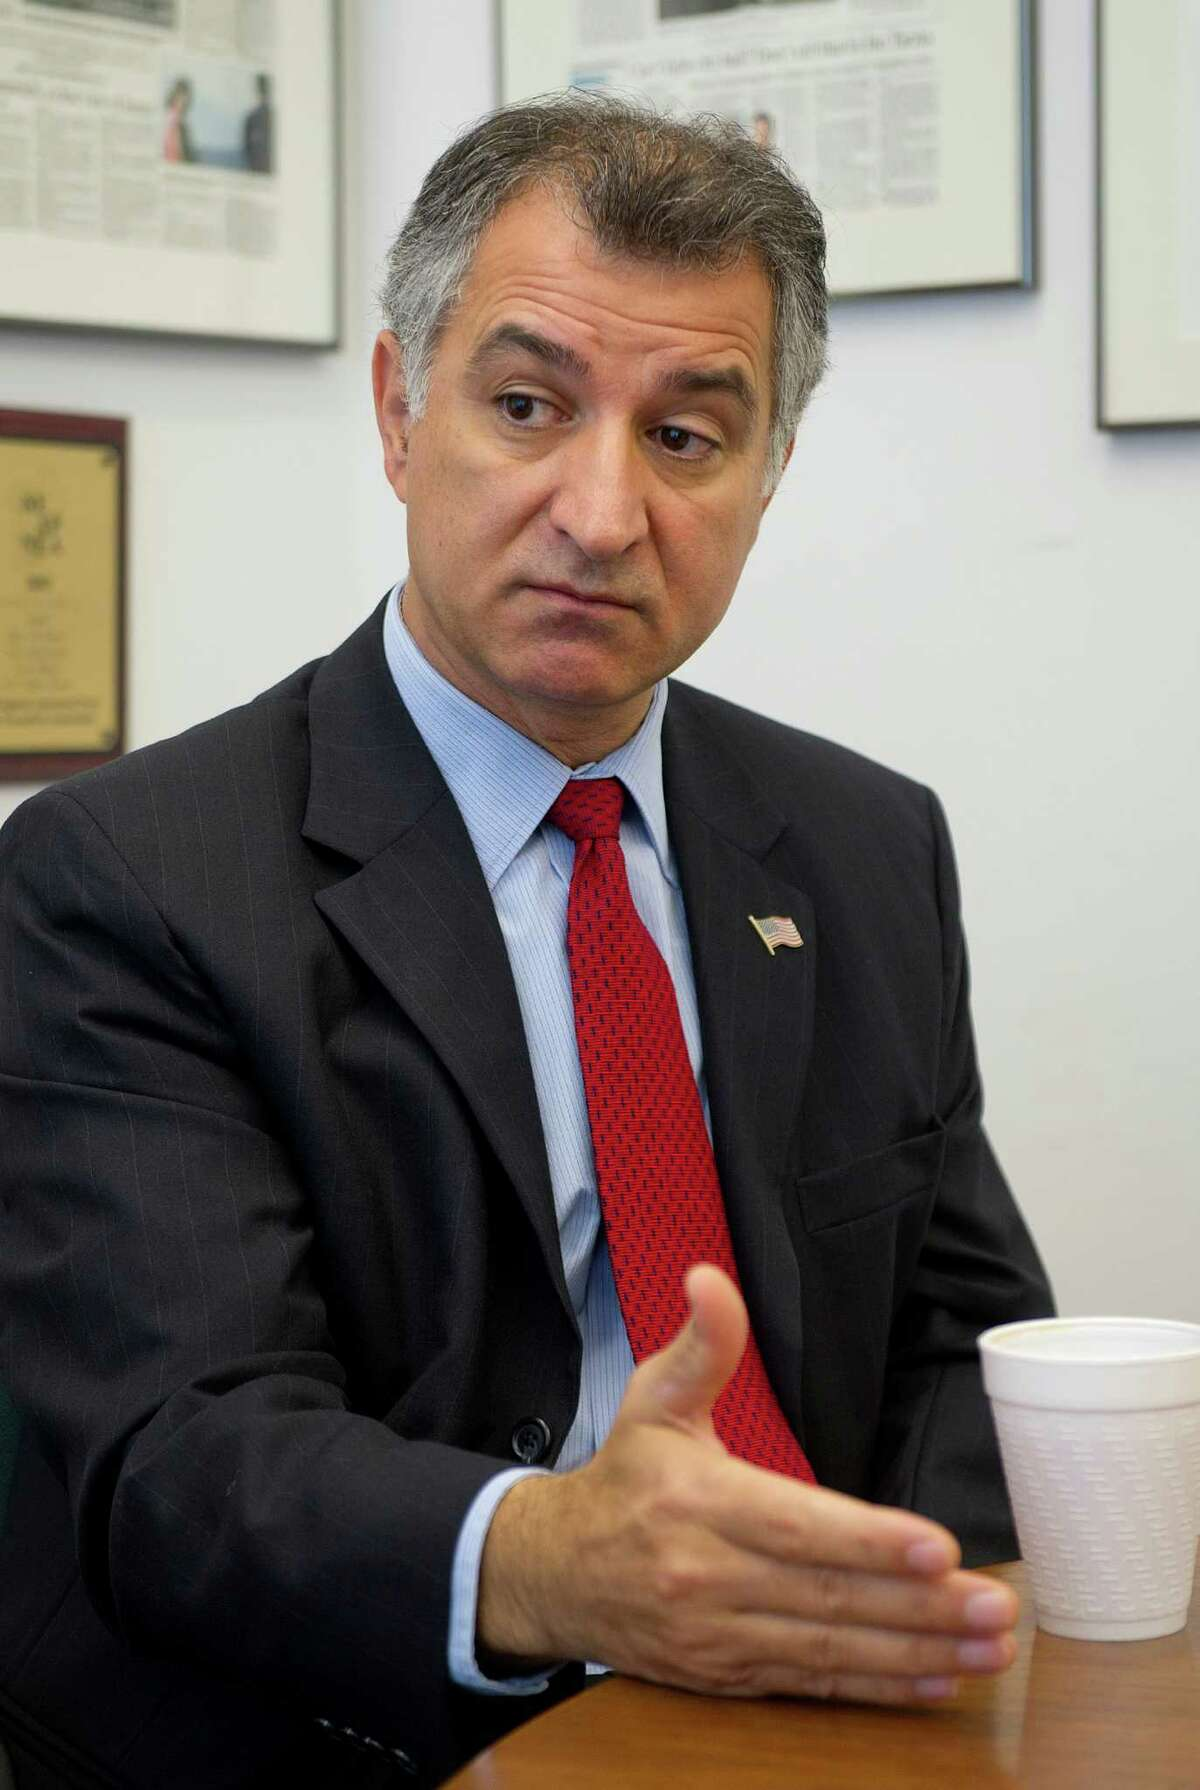 State Sen. Carlo Leone, D-Stamford.